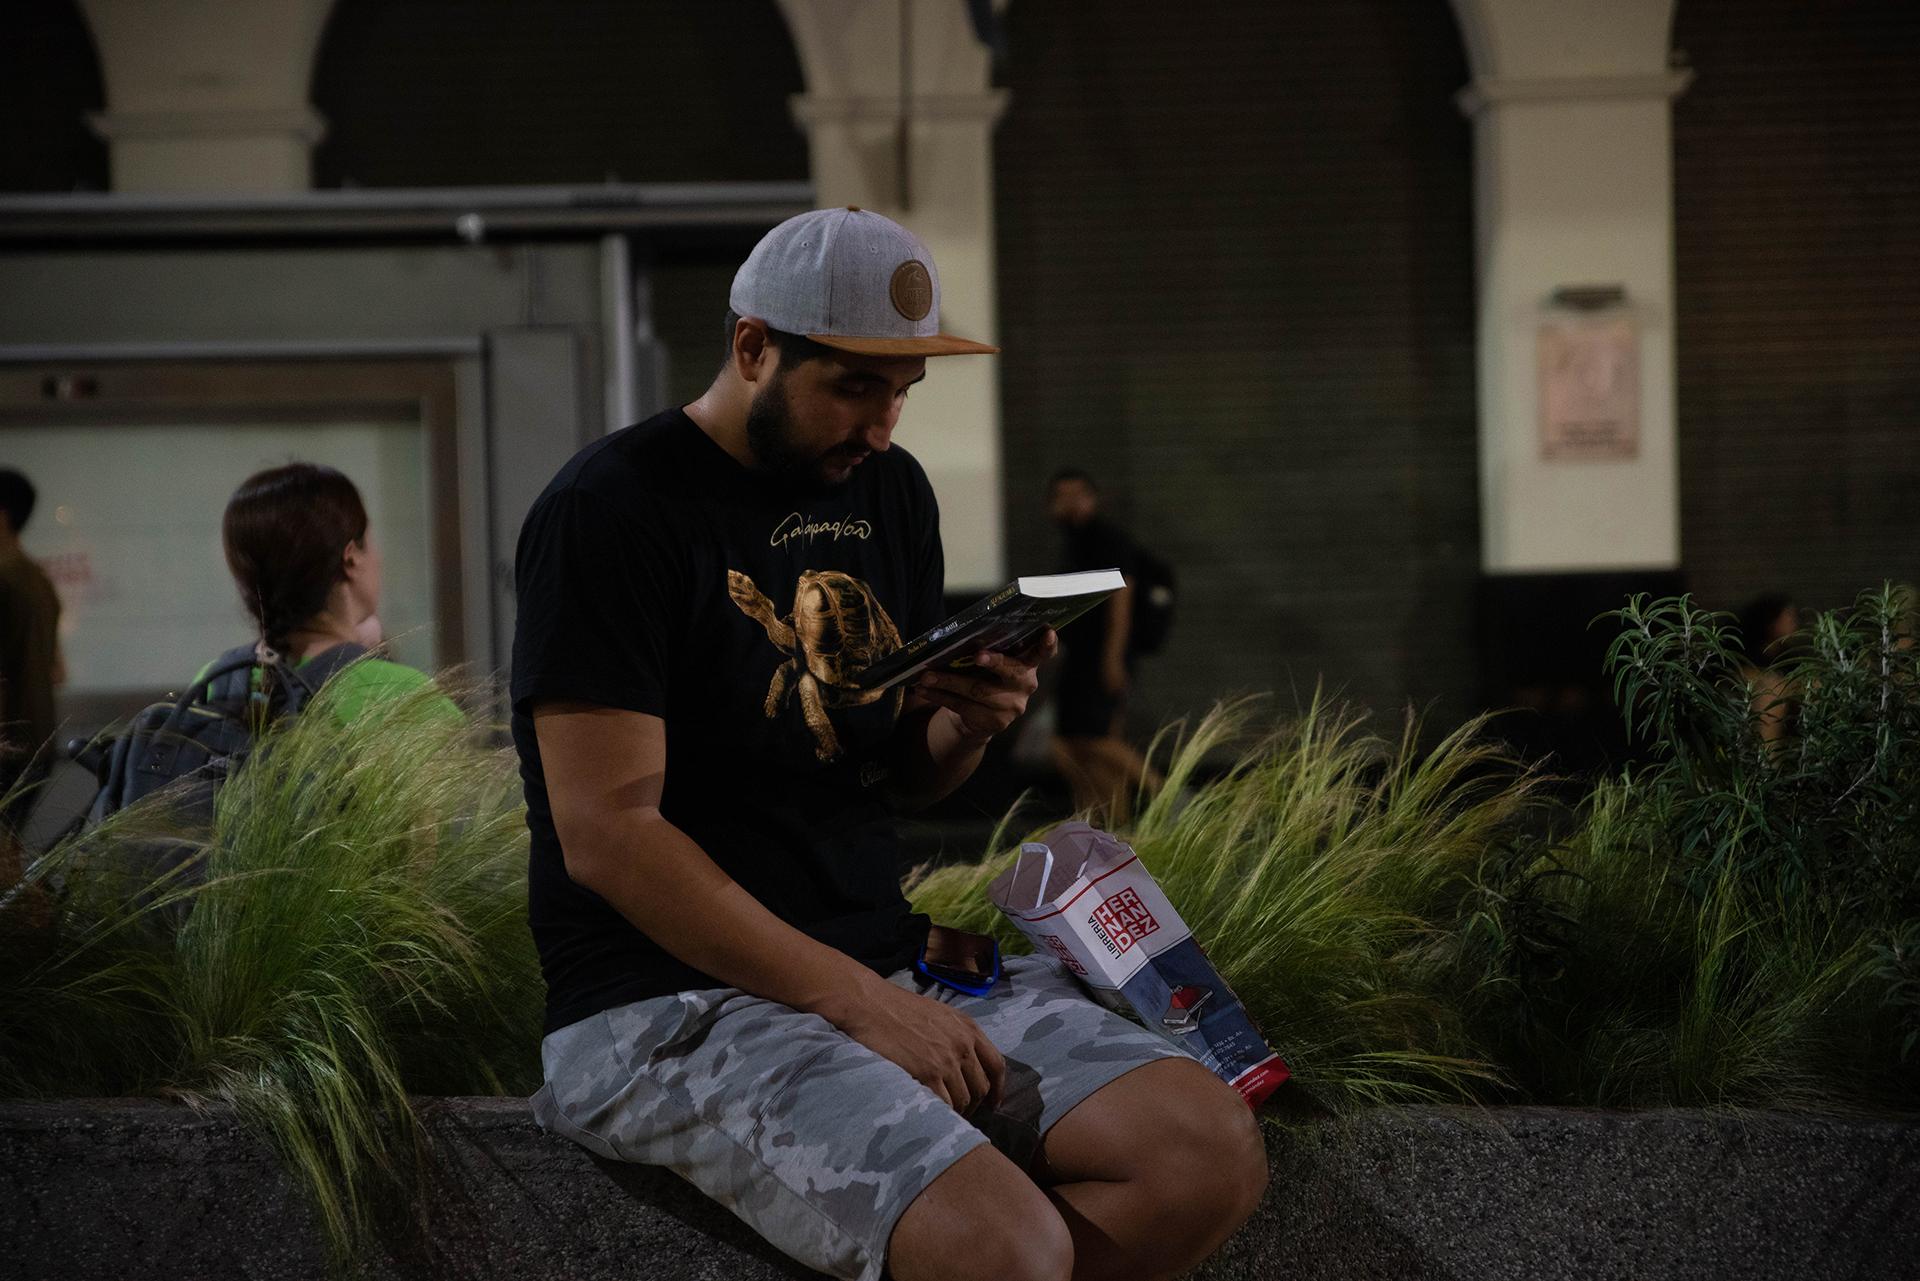 Un joven mira el ejemplar que acaba de comprar.